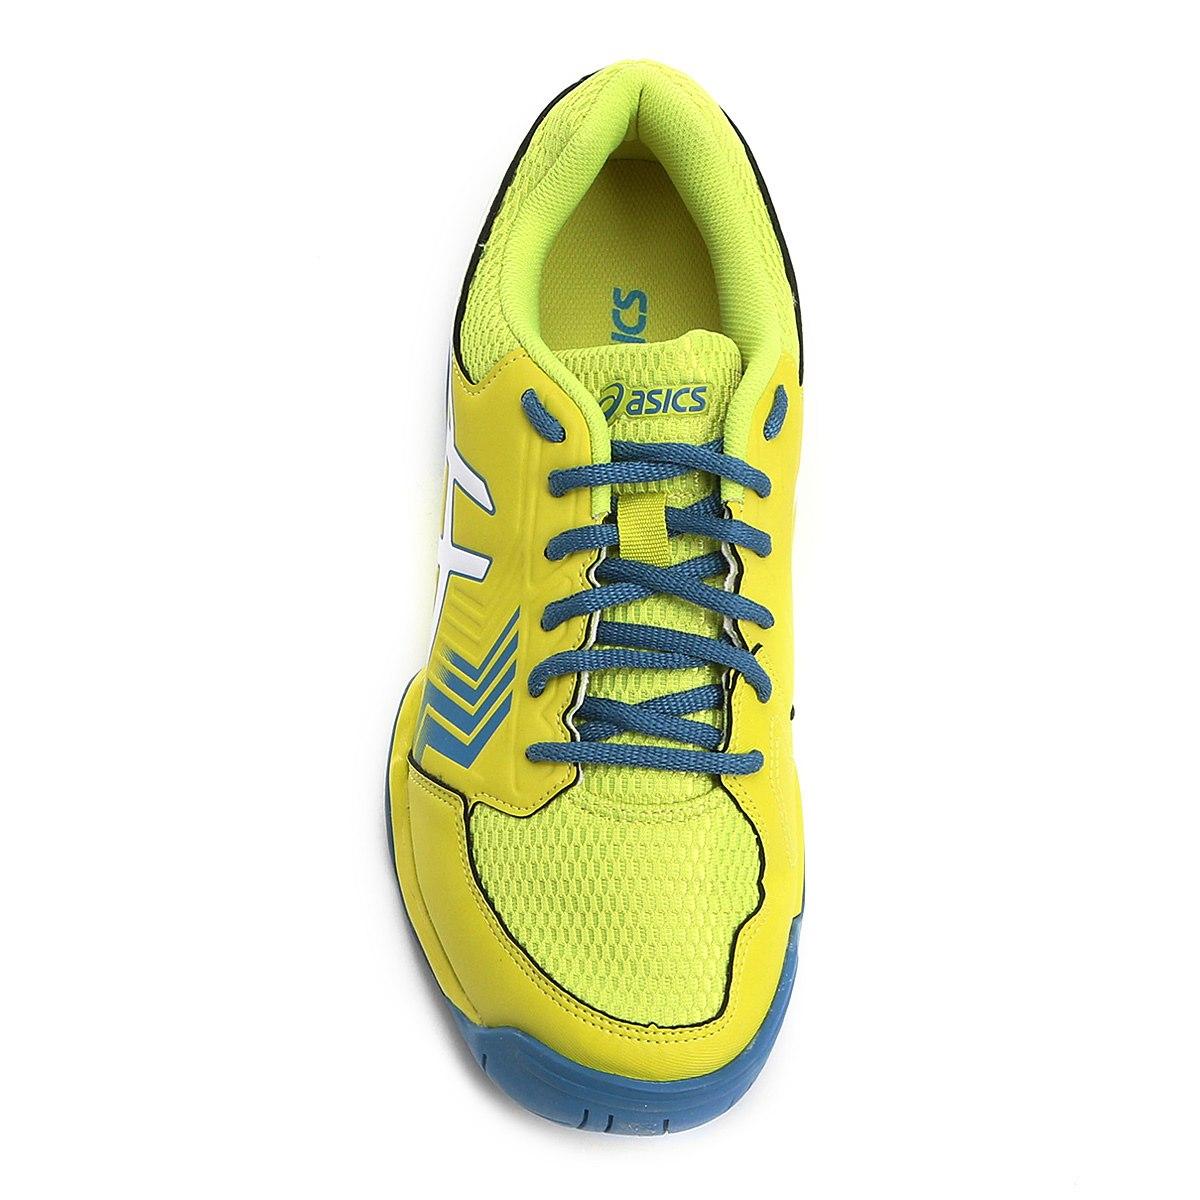 Tenis Asics Gel-dedicate 5 A - Sou Tenista  a5b8753501eca